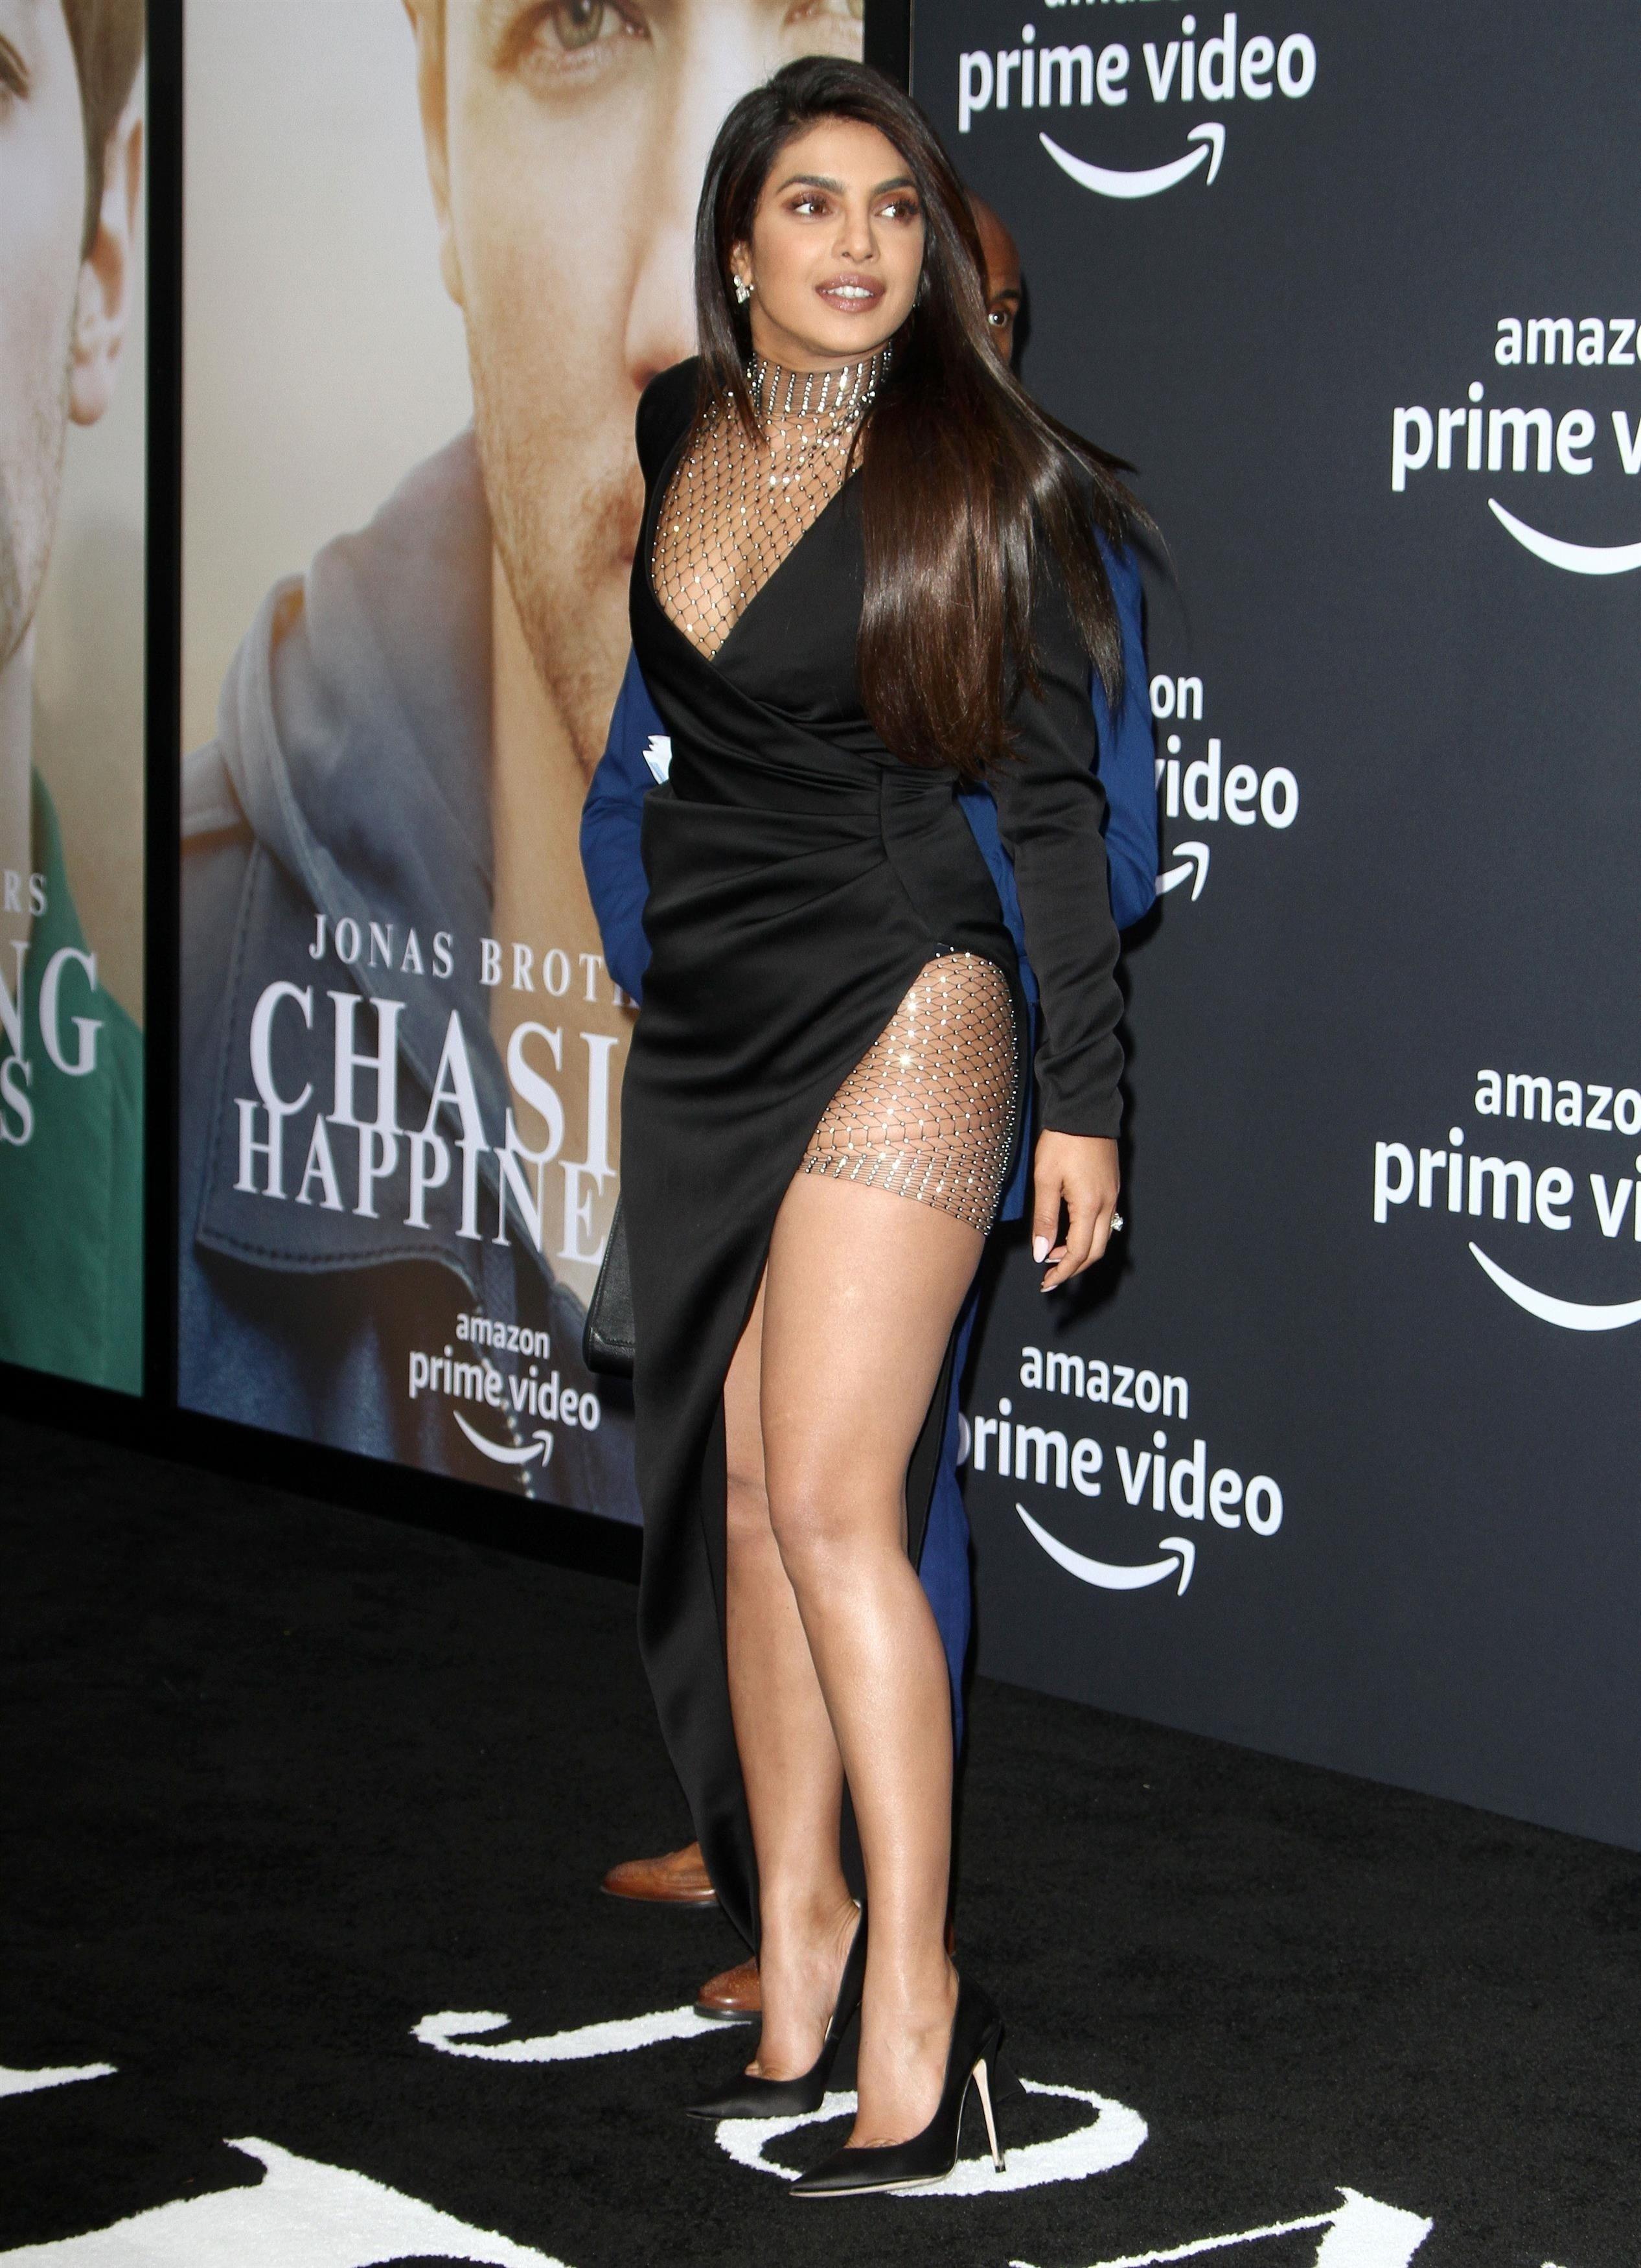 Priyanka Chopra – Amazon Prime Video's 'Chasing Happiness' premiere in Los Angeles 3-6-2019